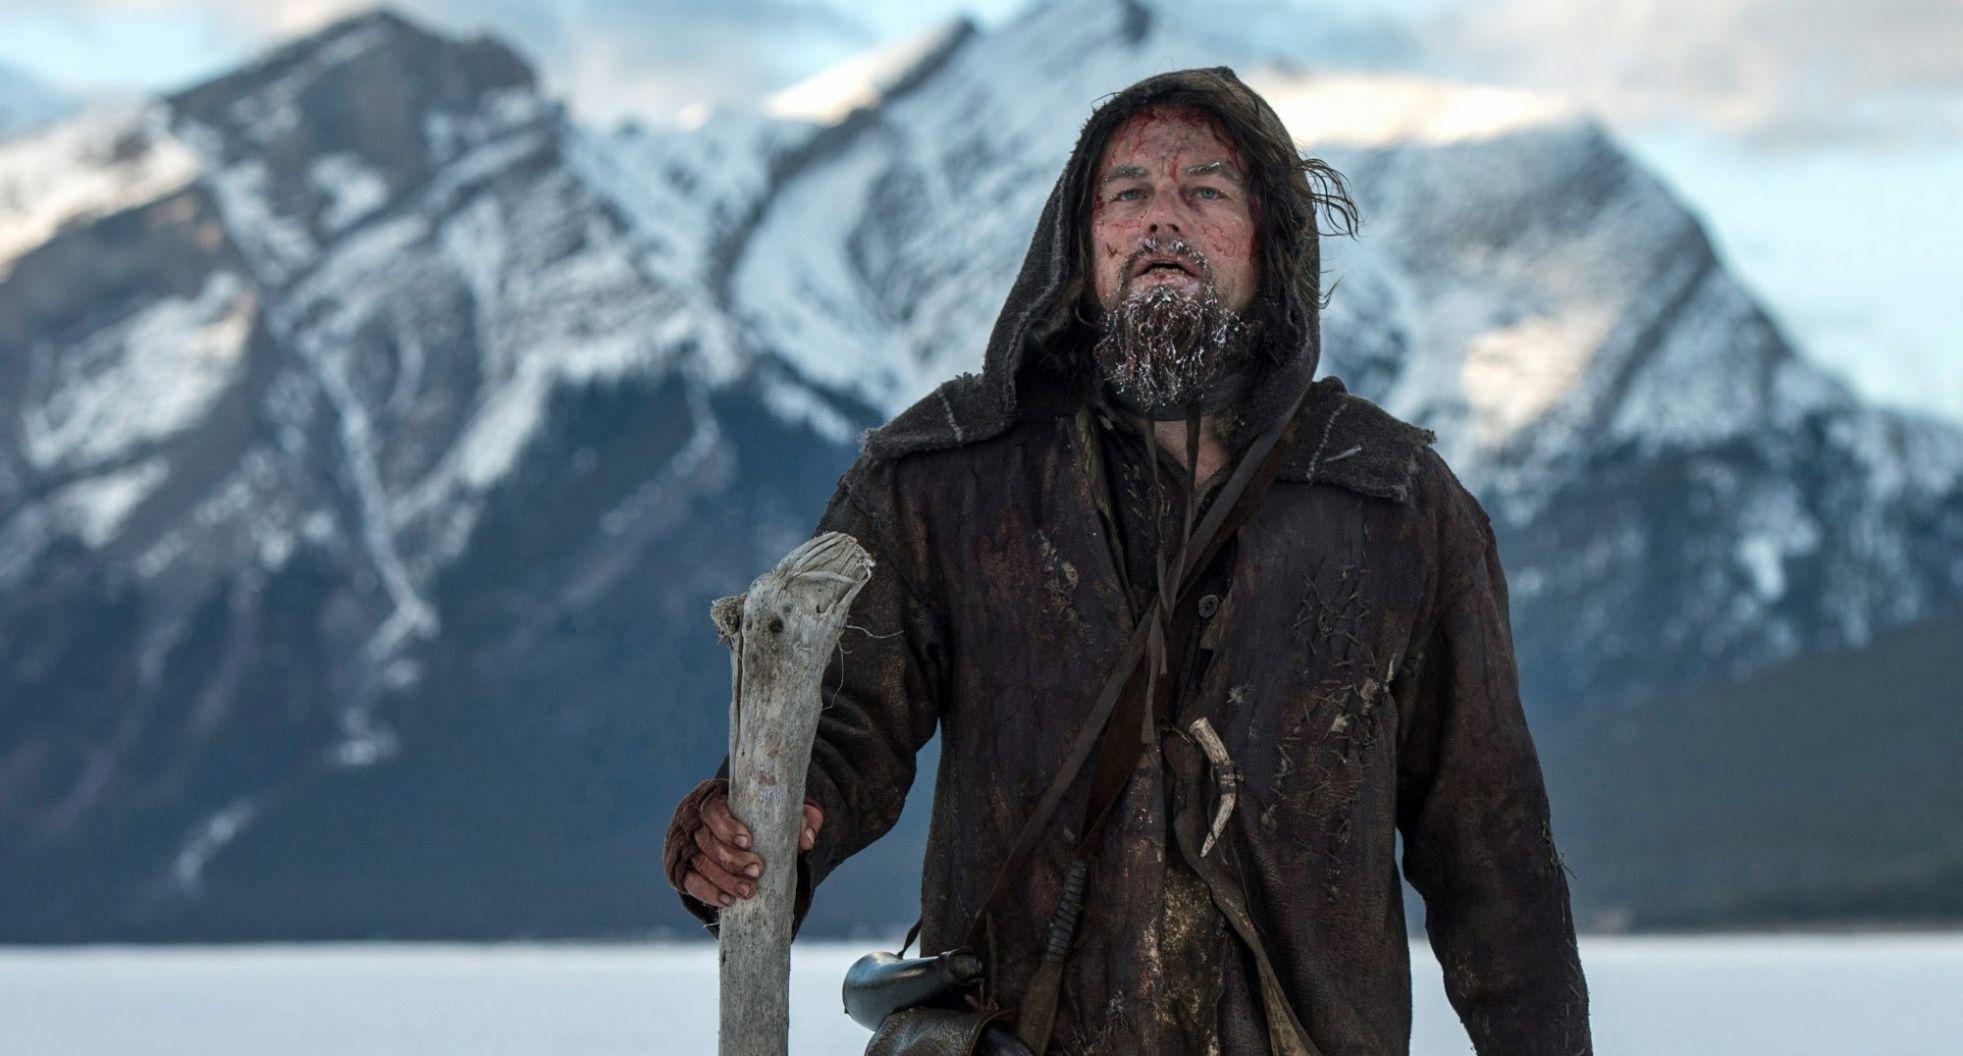 Mountain man - Wikipedia